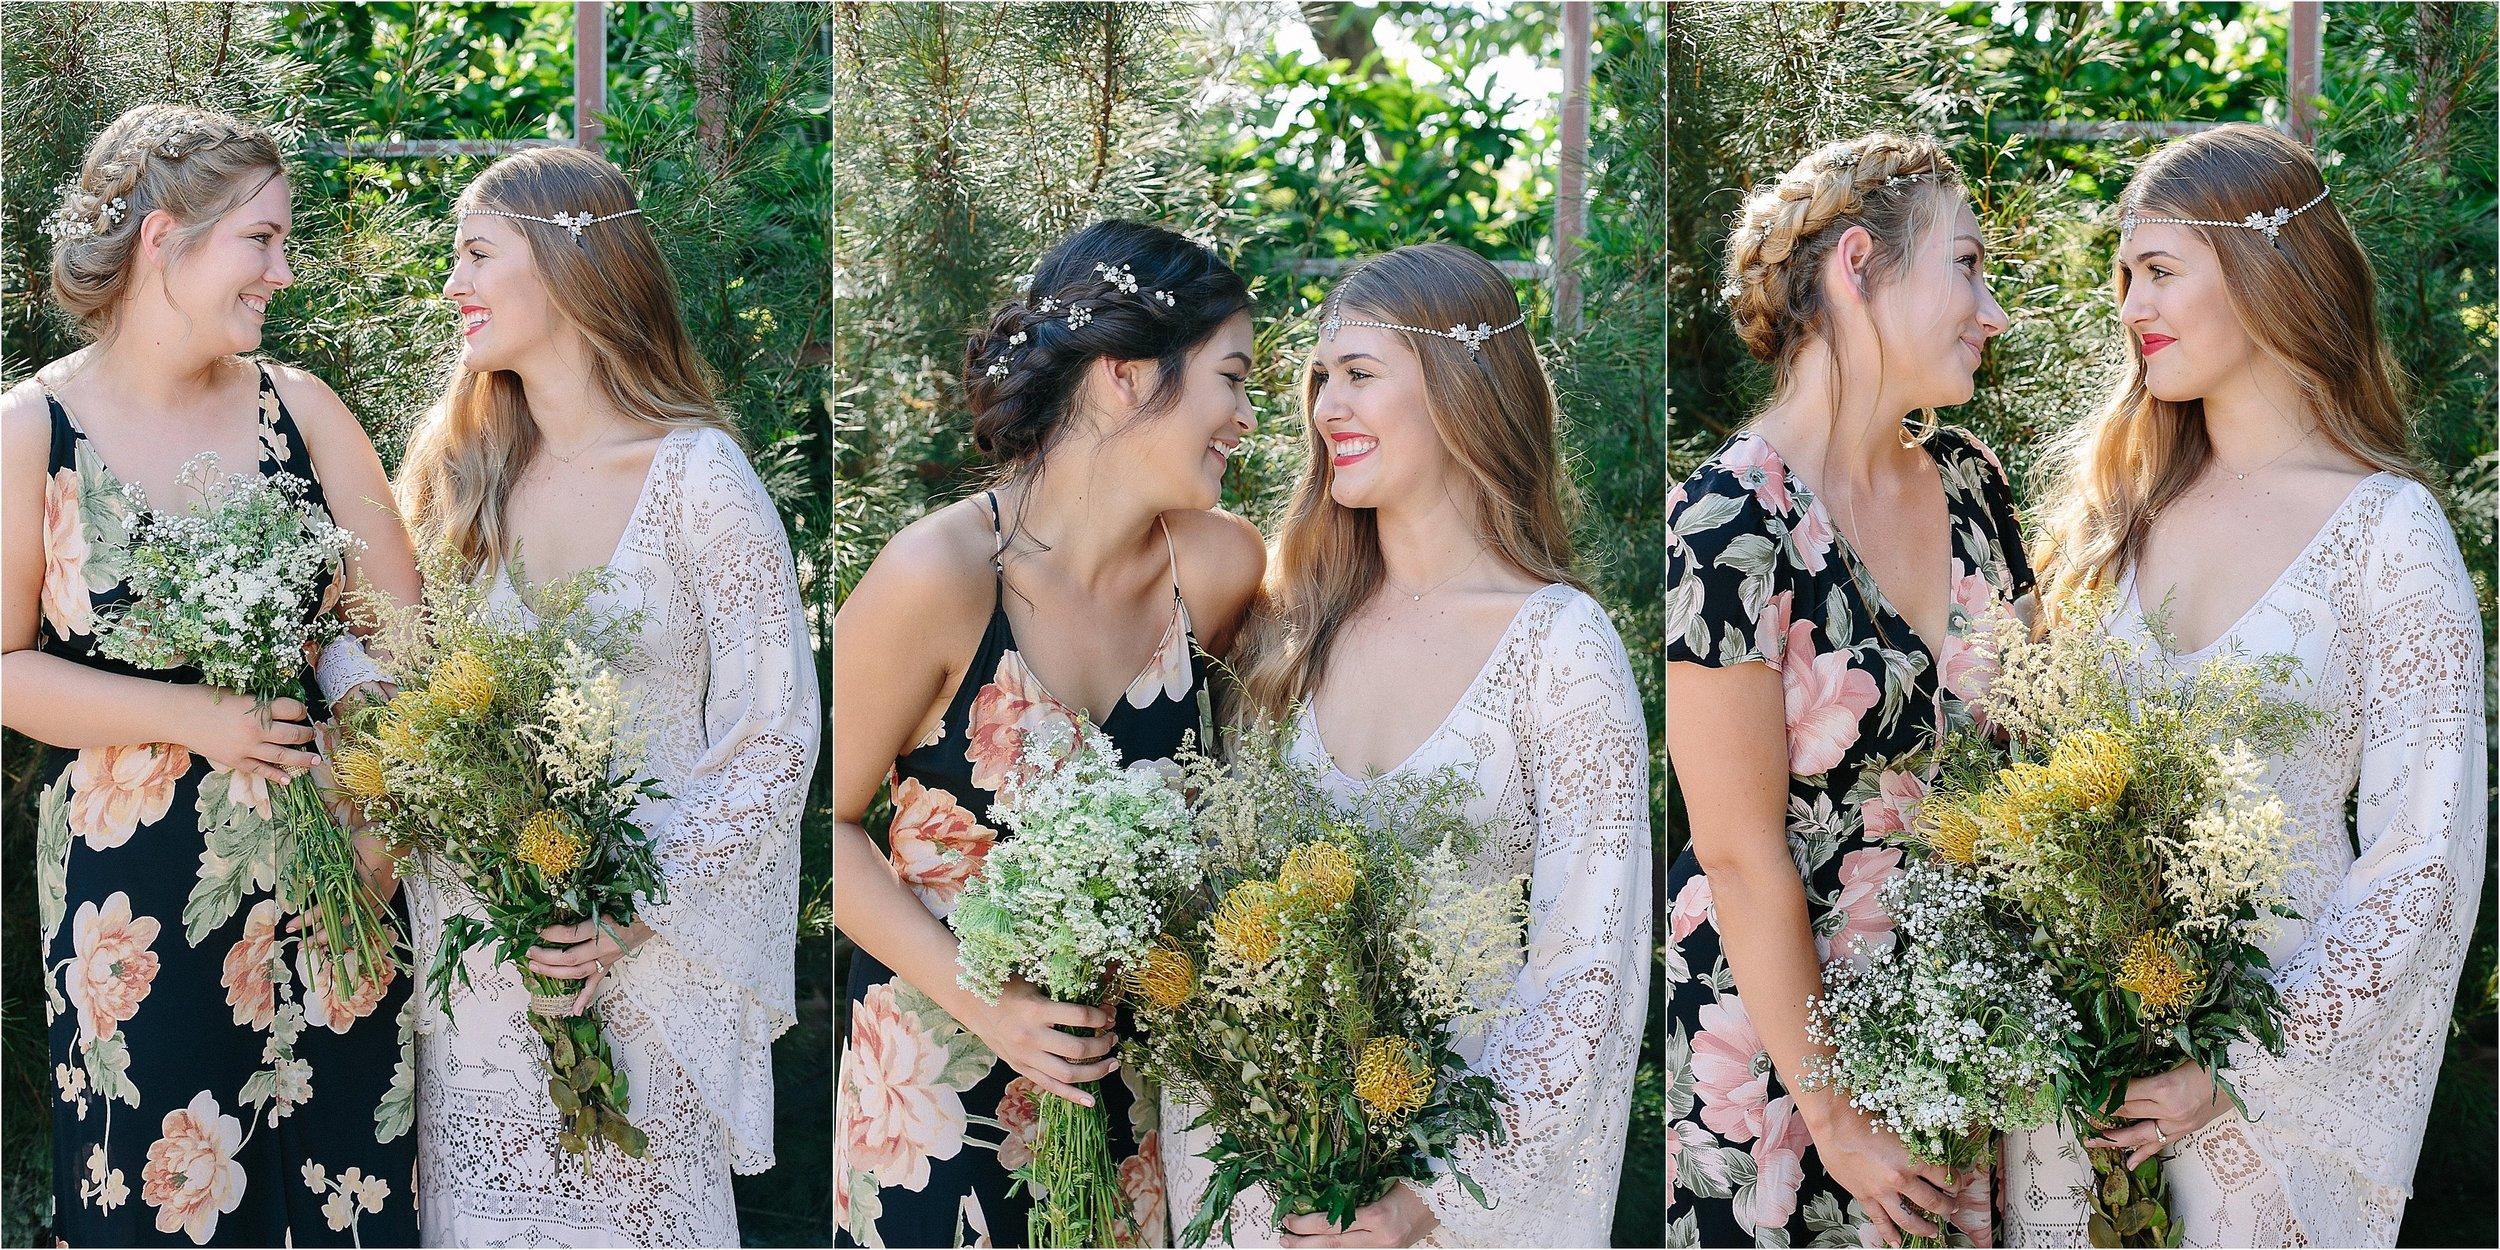 A Bride & her maids